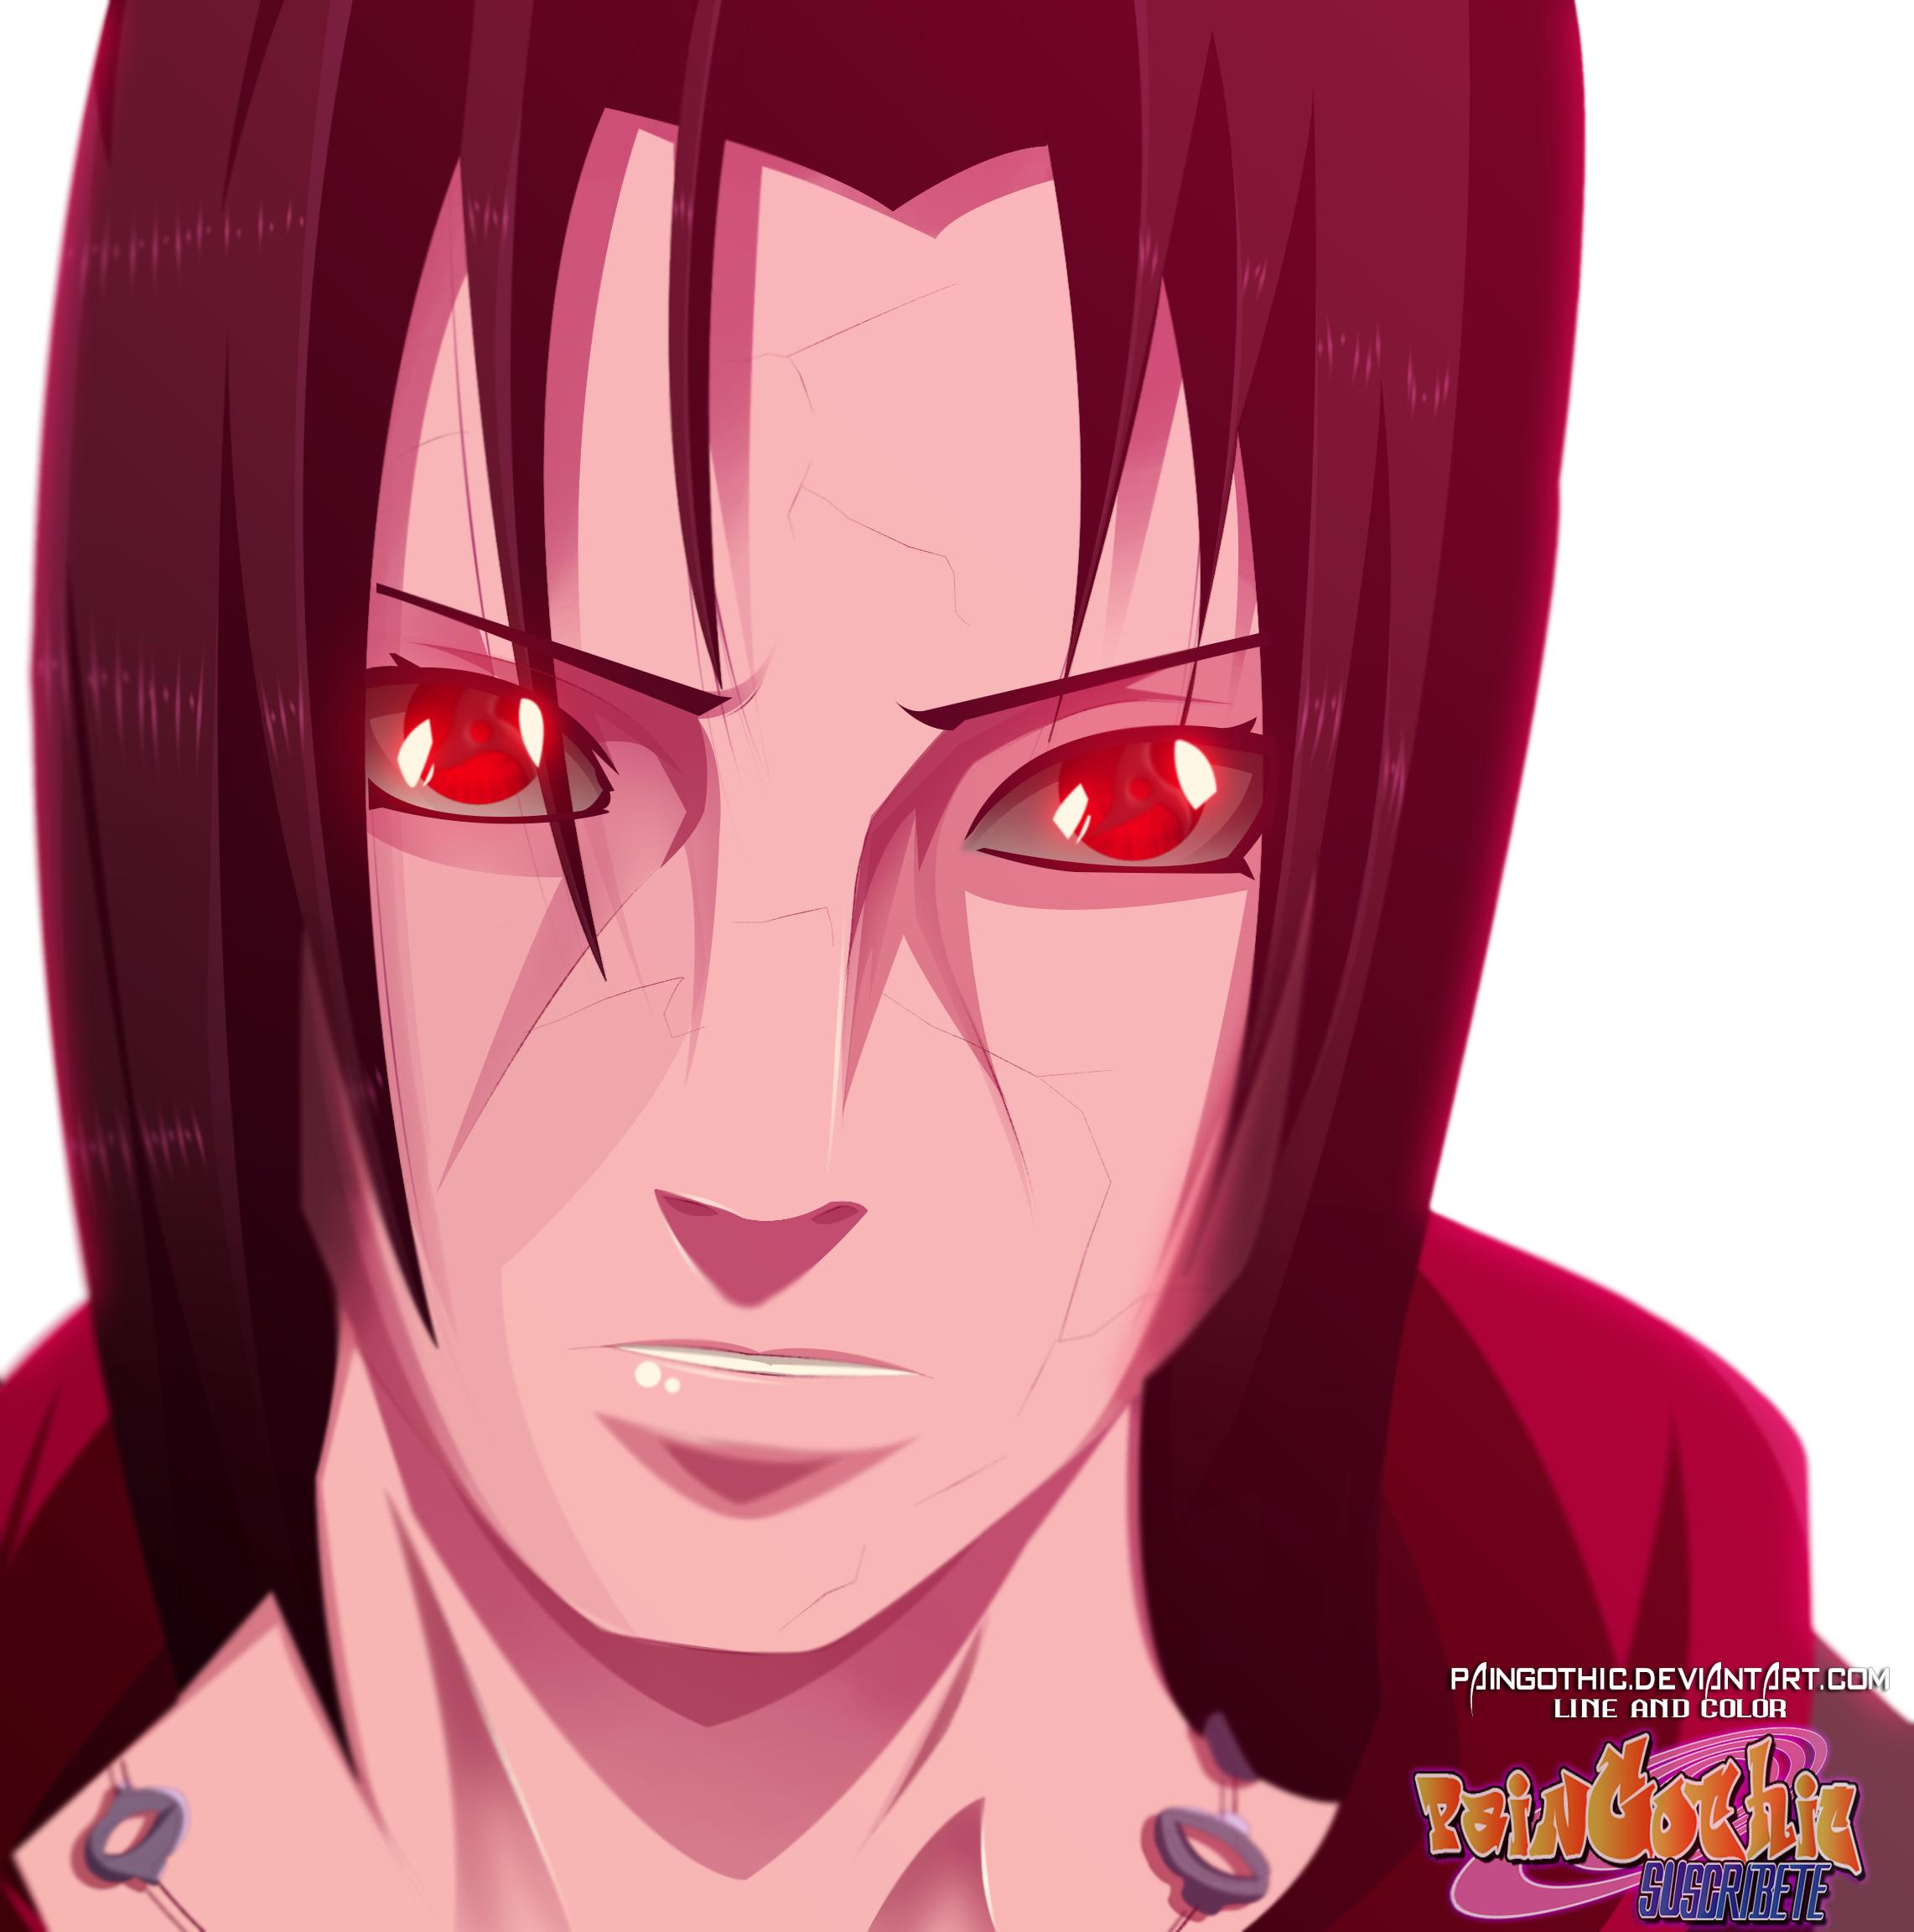 Naruto By PainGothic On DeviantArt